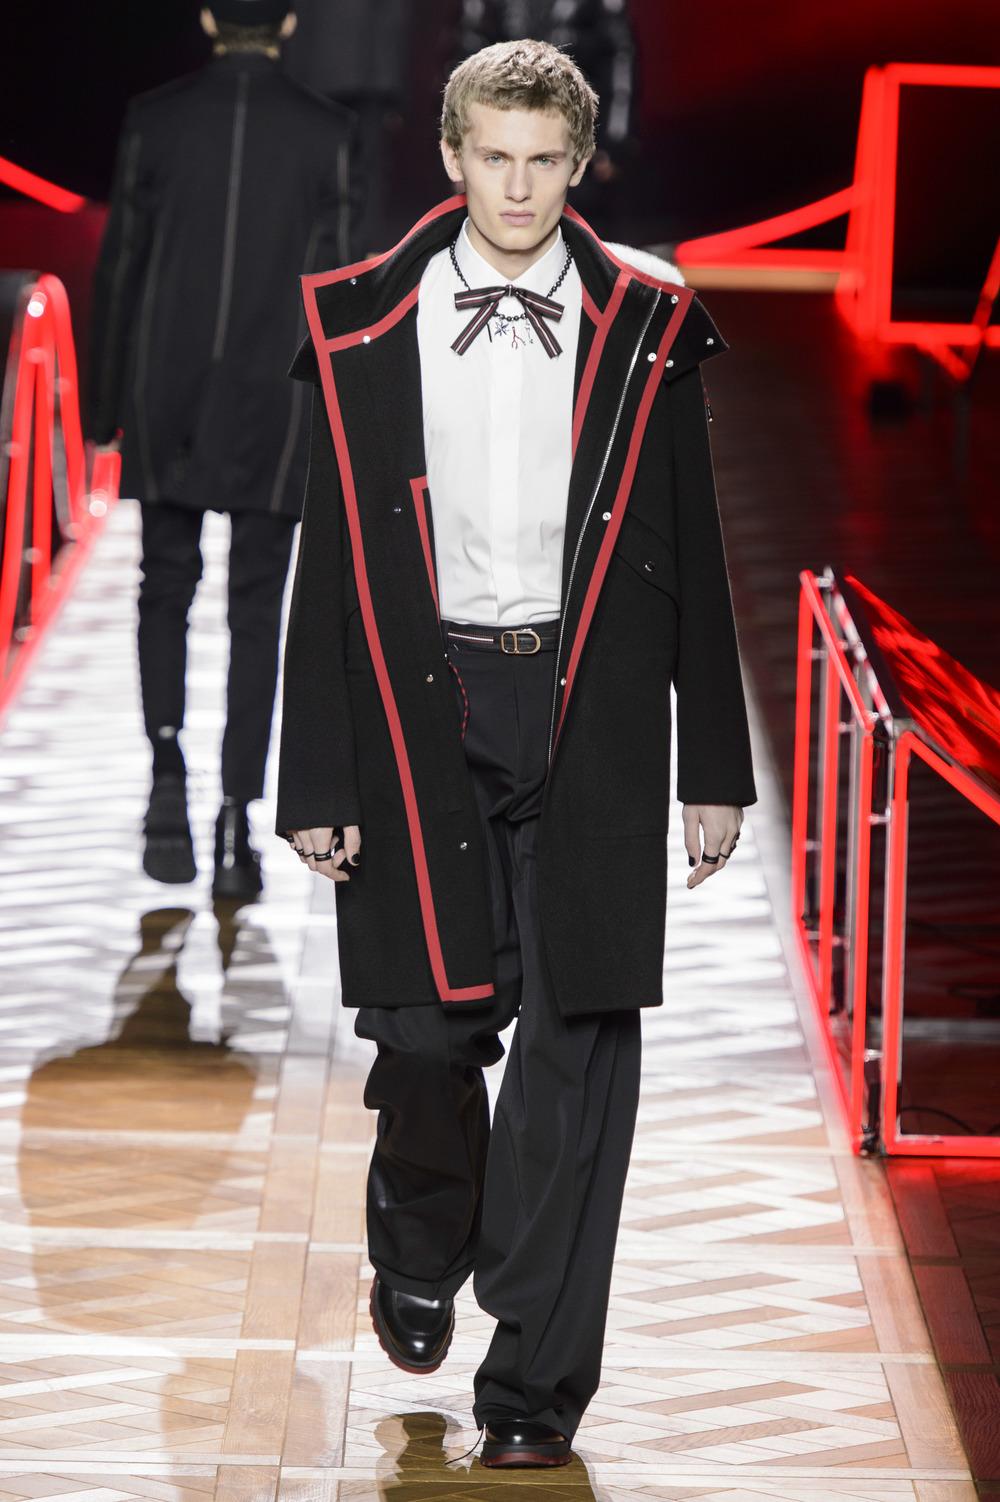 Dior_Homme_Hiver2016-17_look_09.JPG